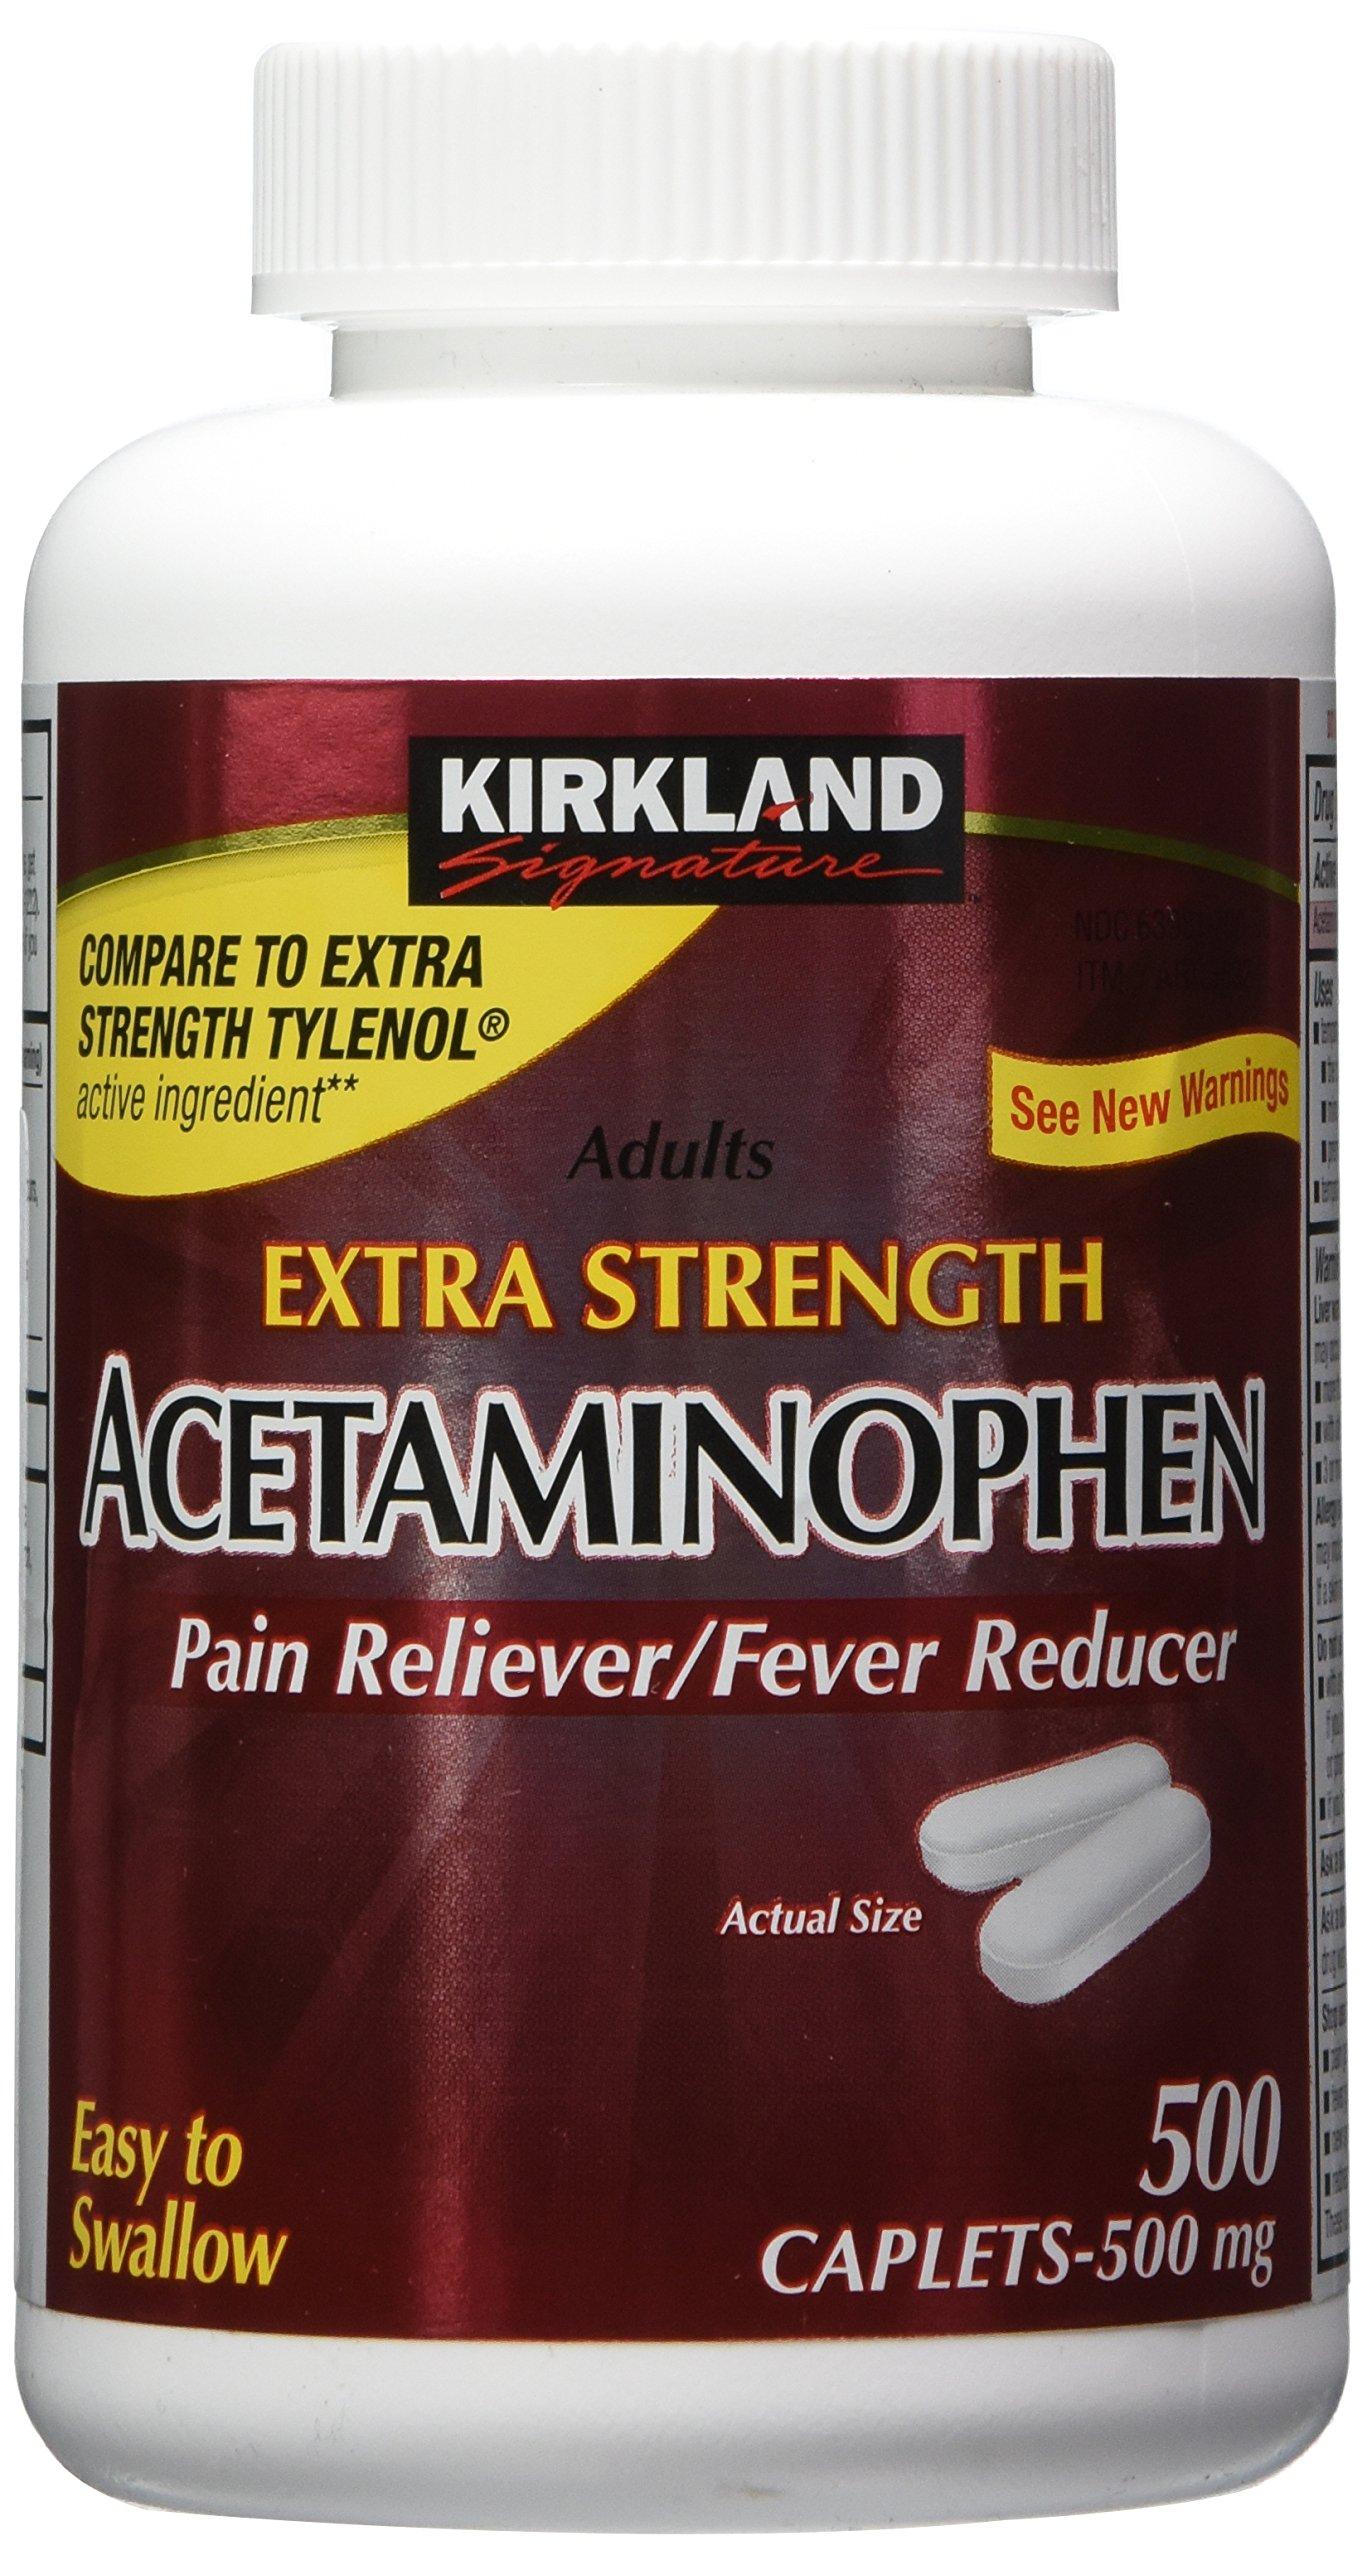 Kirkland Signature Extra Strength Acetaminophen 500MG Caplets, 500-Count Bottle